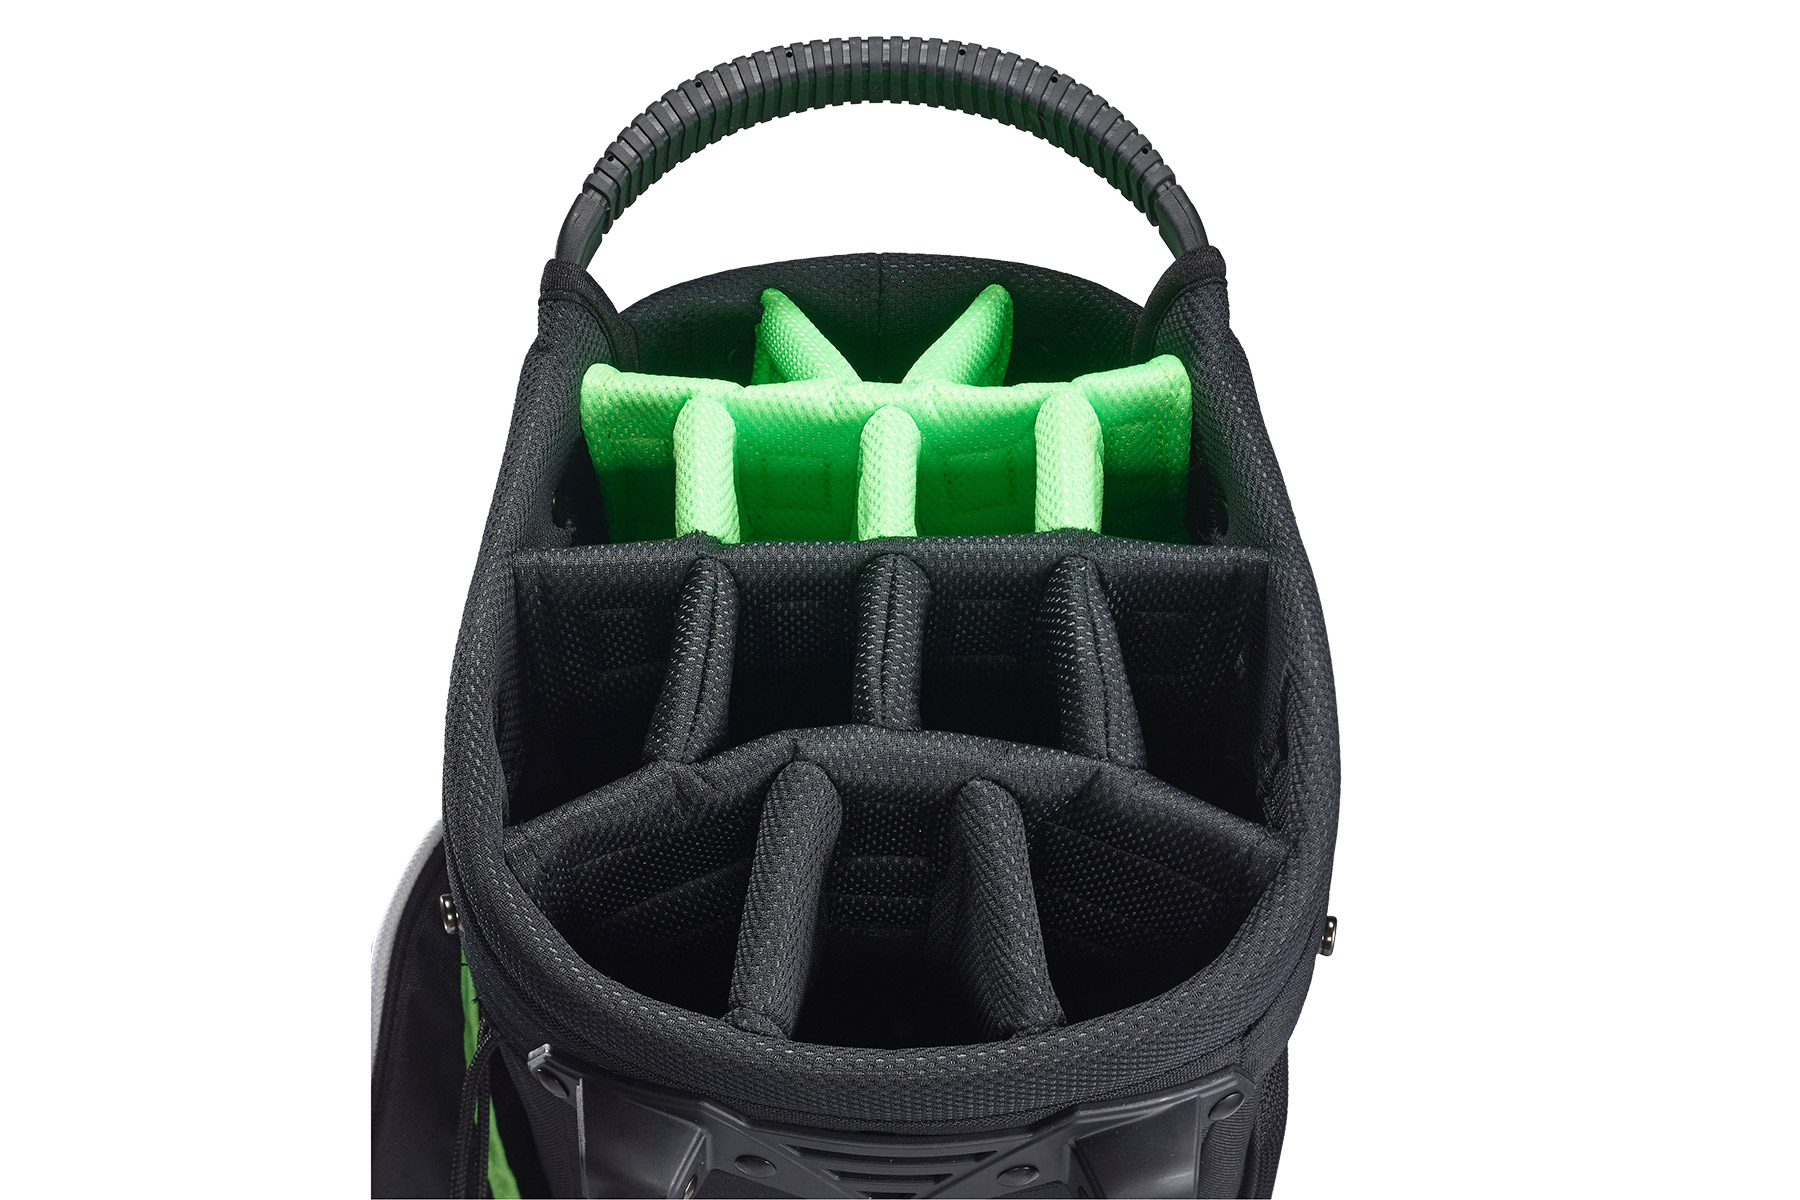 Cobra Golf King F6 Stand Bag Online Golf